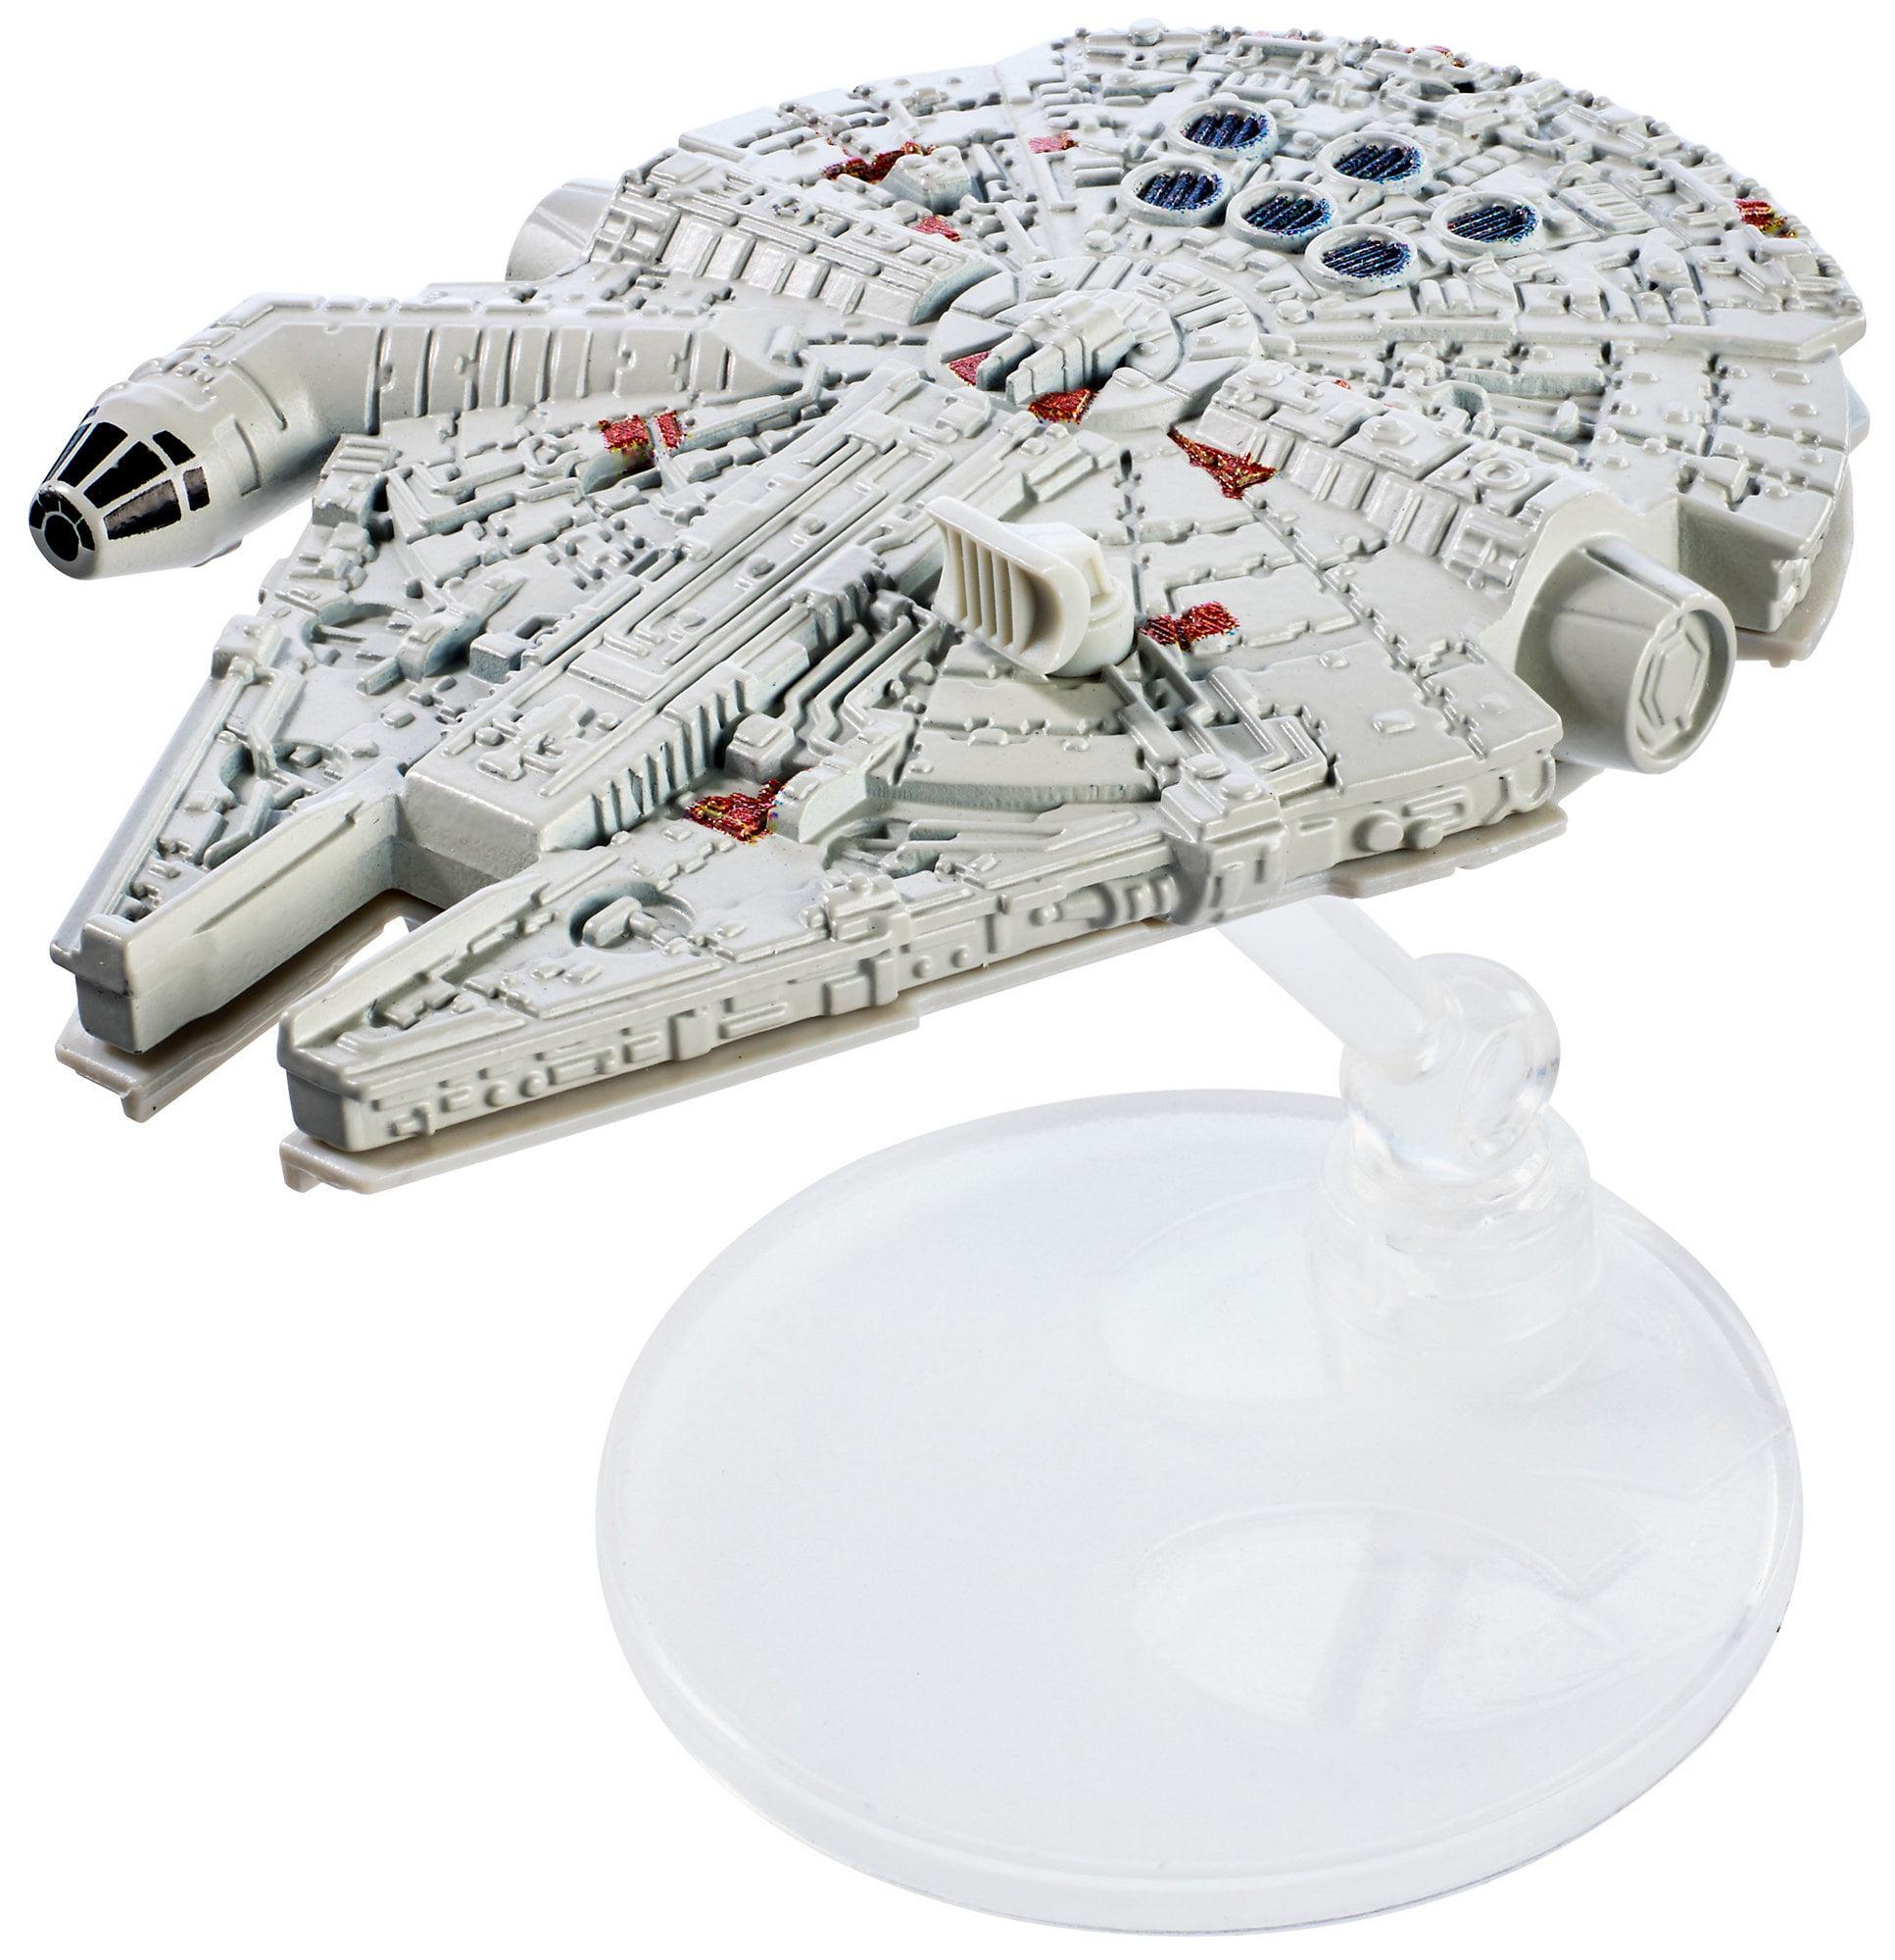 Hot Wheels Star Wars: The Last Jedi Millennium Falcon, Starship by Mattel